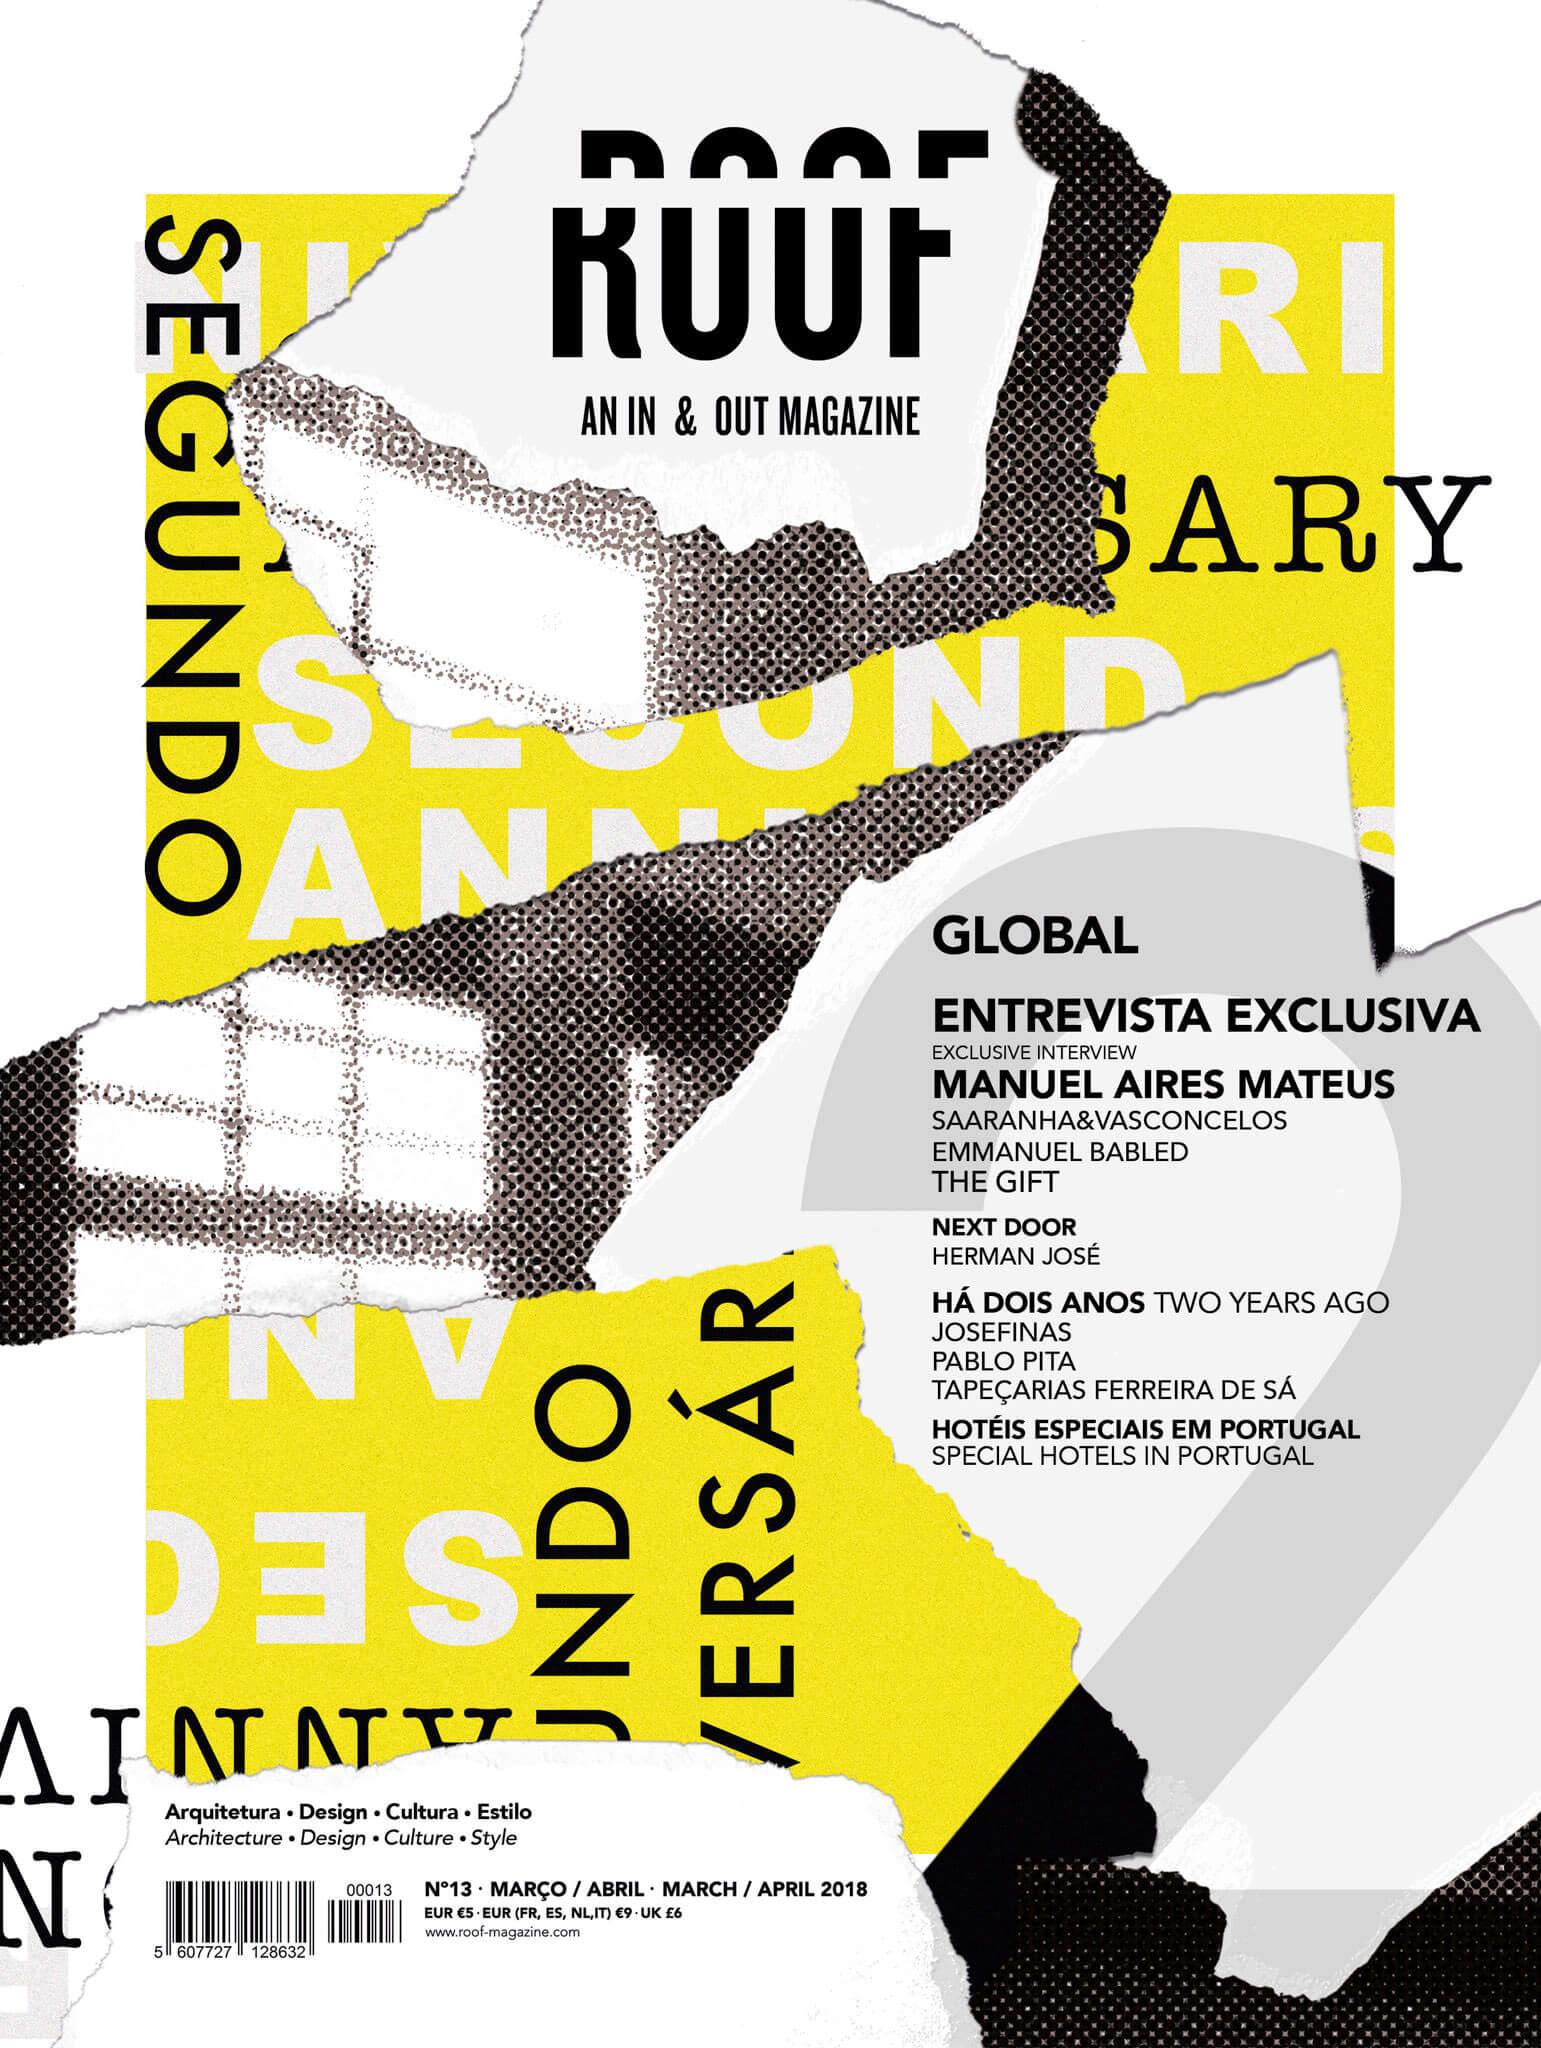 Roof Magazine publica projecto de Paulo Martins com fotografia de arquitectura de Ivo Tavares Studio